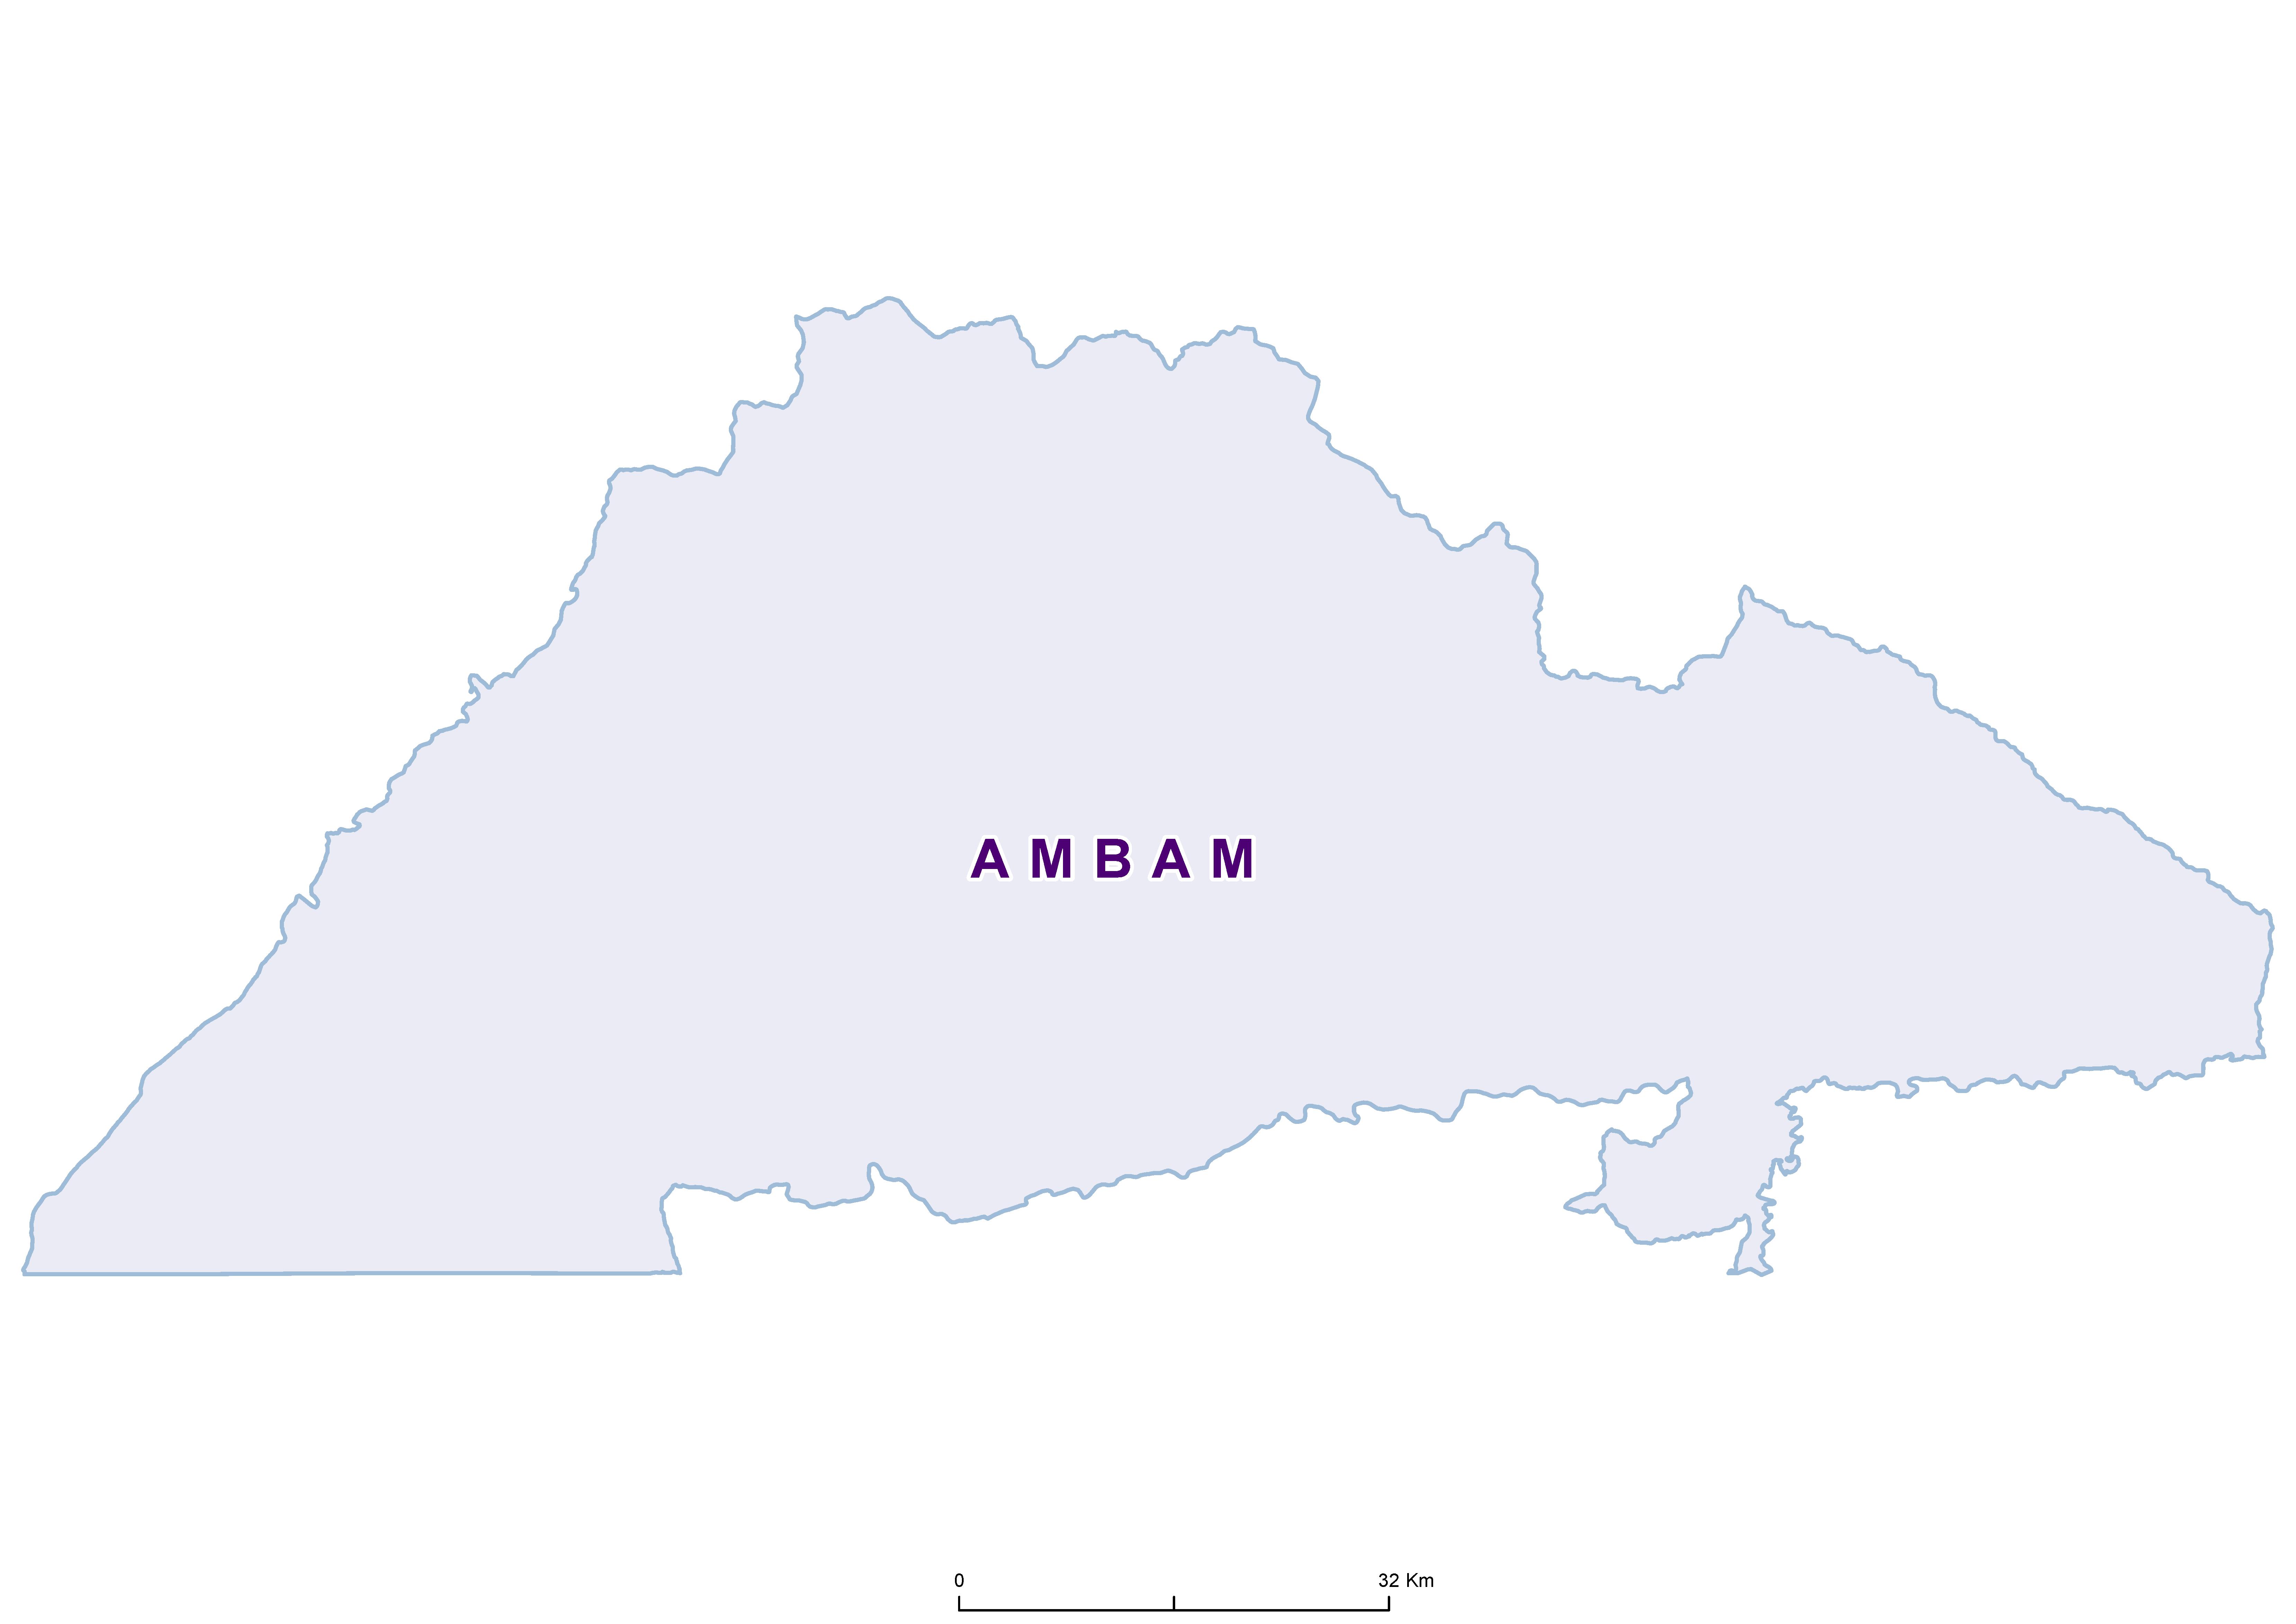 Ambam Max STH 20180001